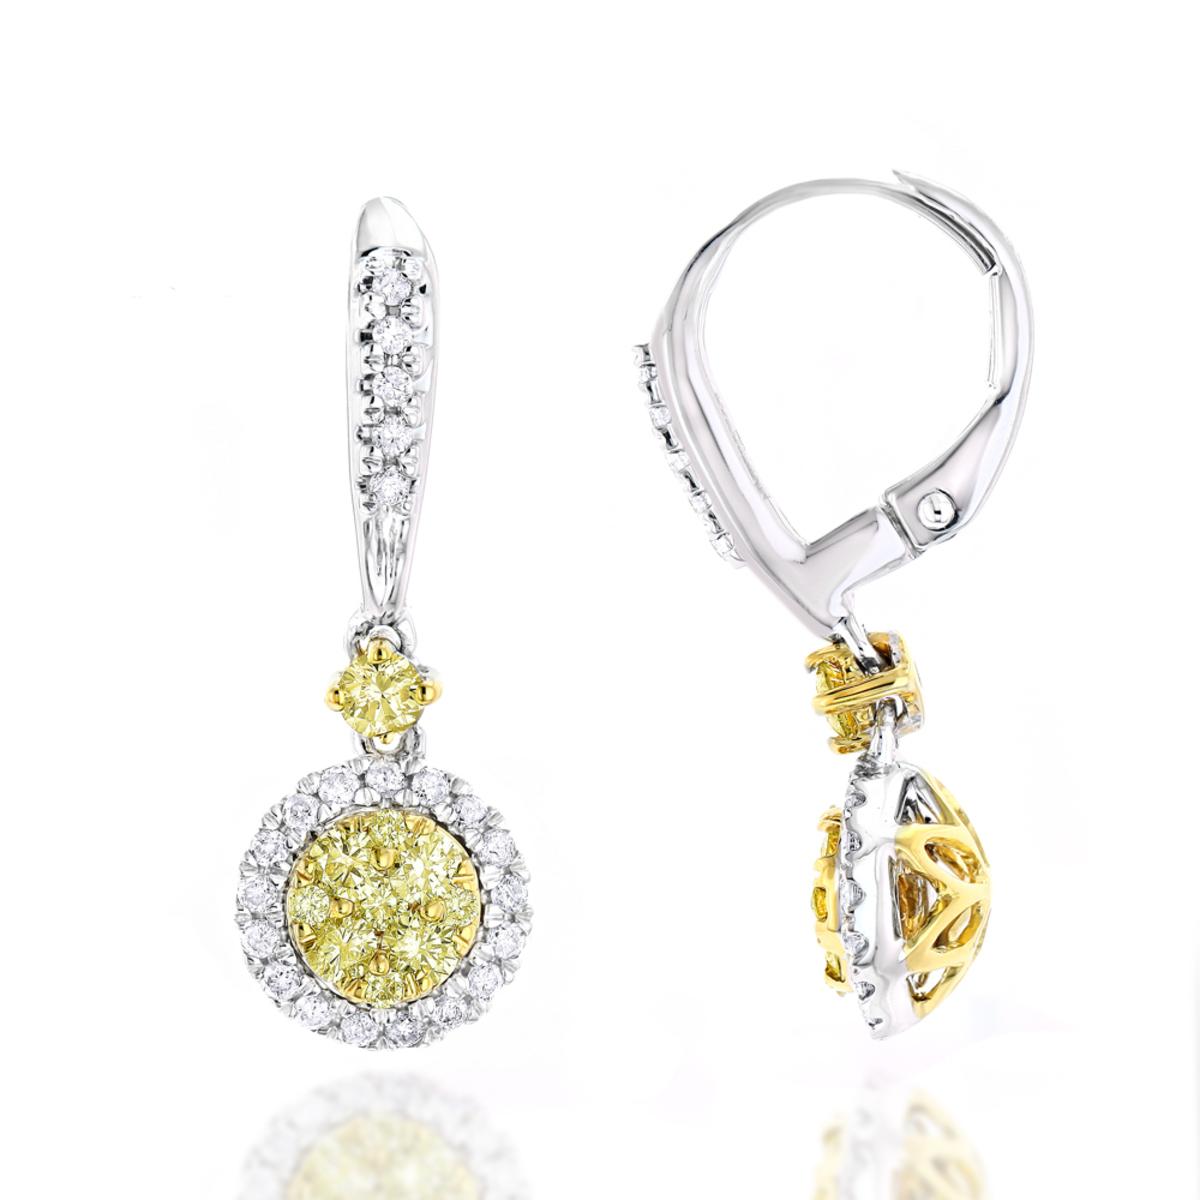 14K Gold White Yellow Diamond Drop Earrings 1.2ct Womens Dangle Hoops